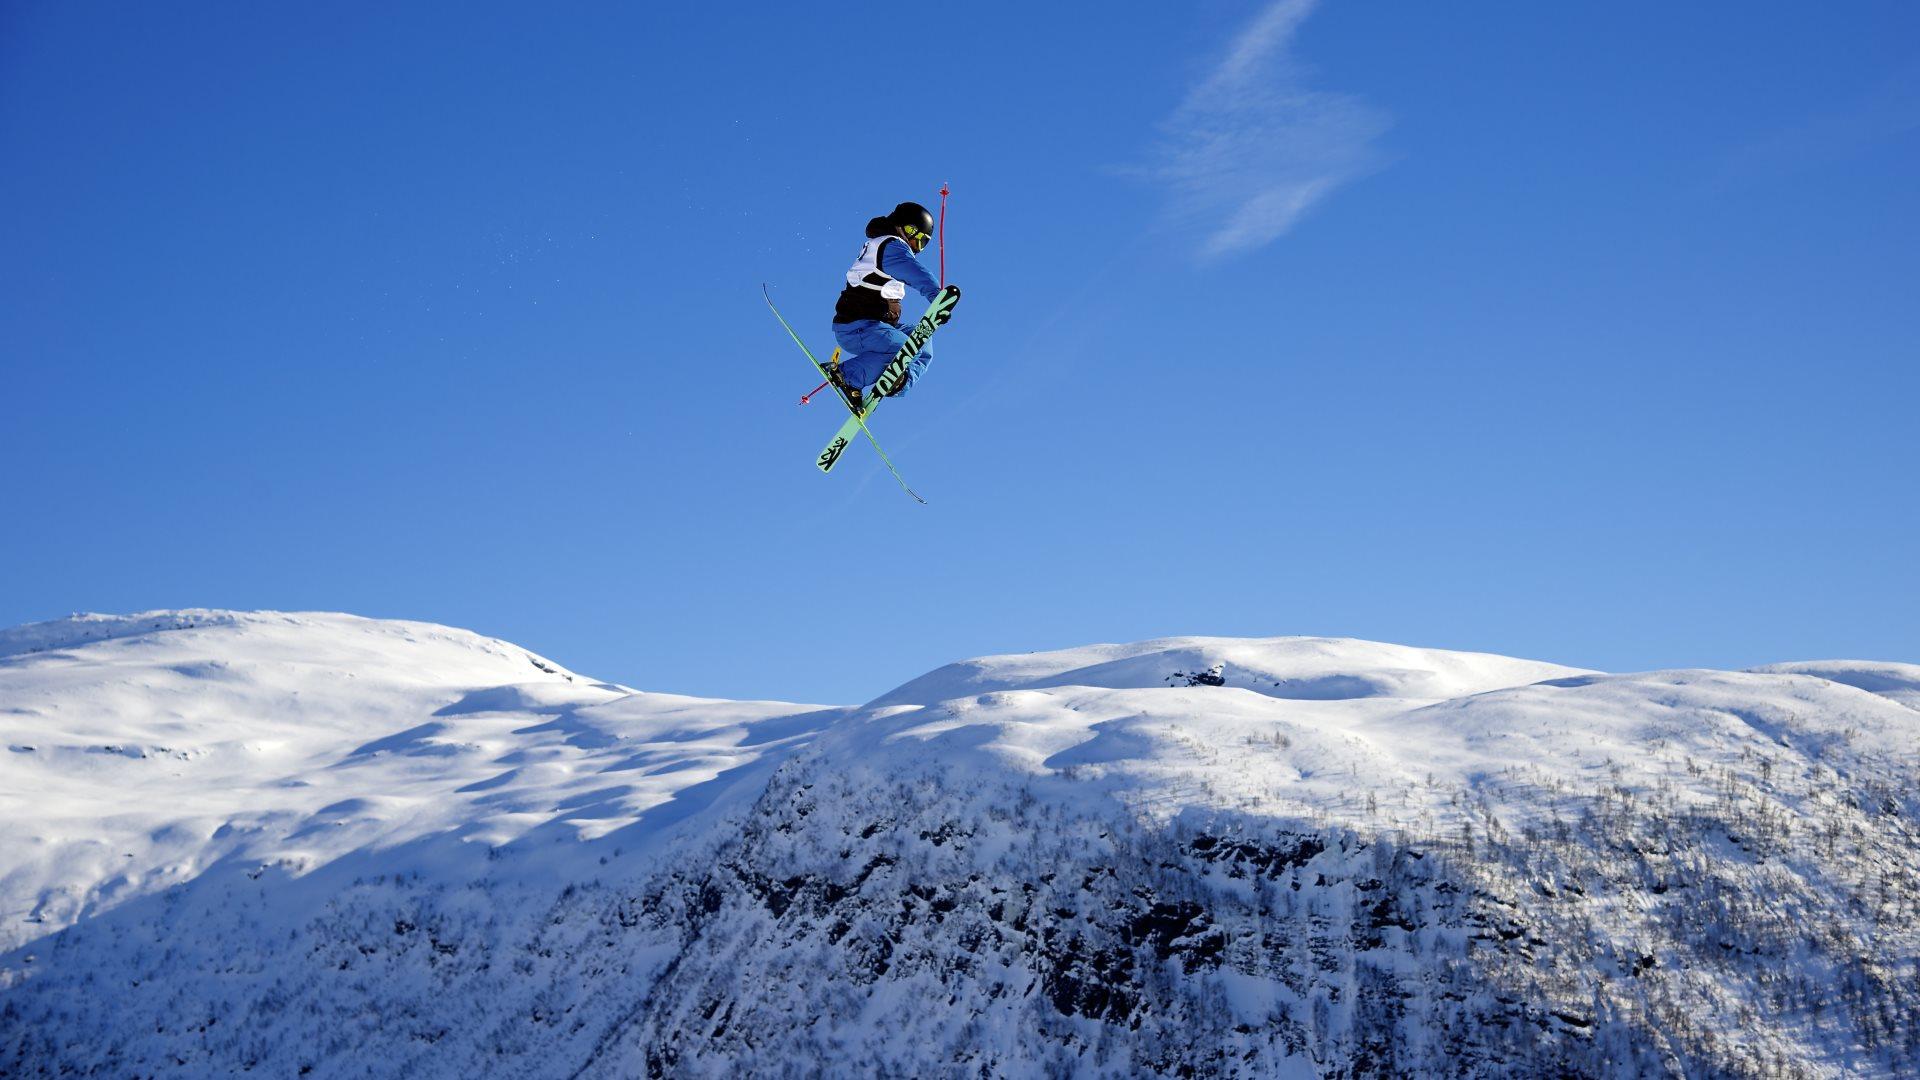 freestyle skiing wallpaper - photo #7